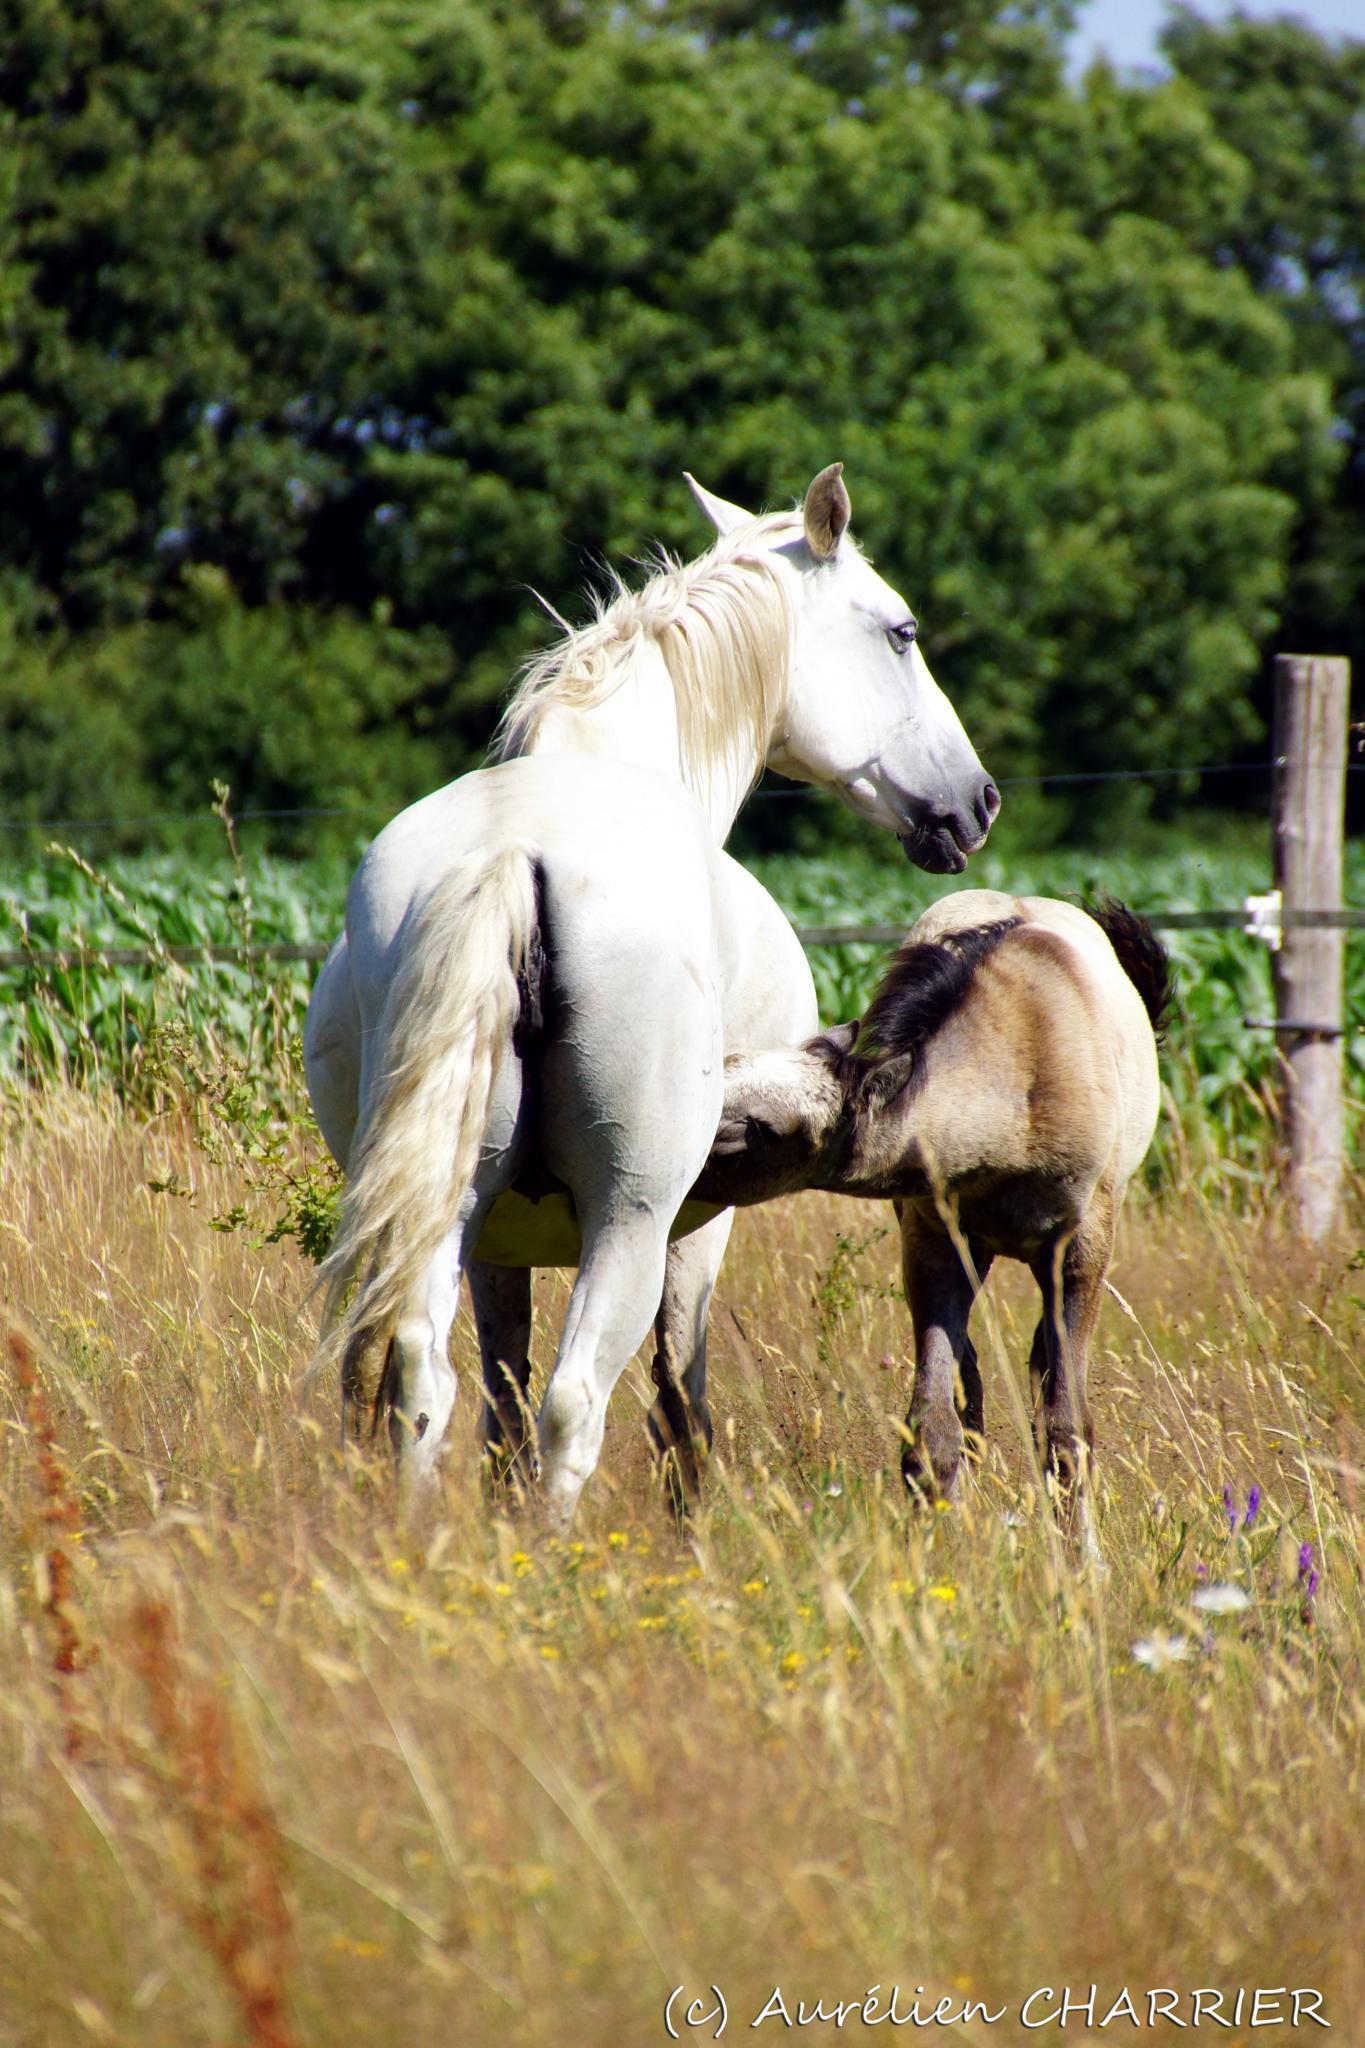 The thirsty foal by Aurélien CHARRIER